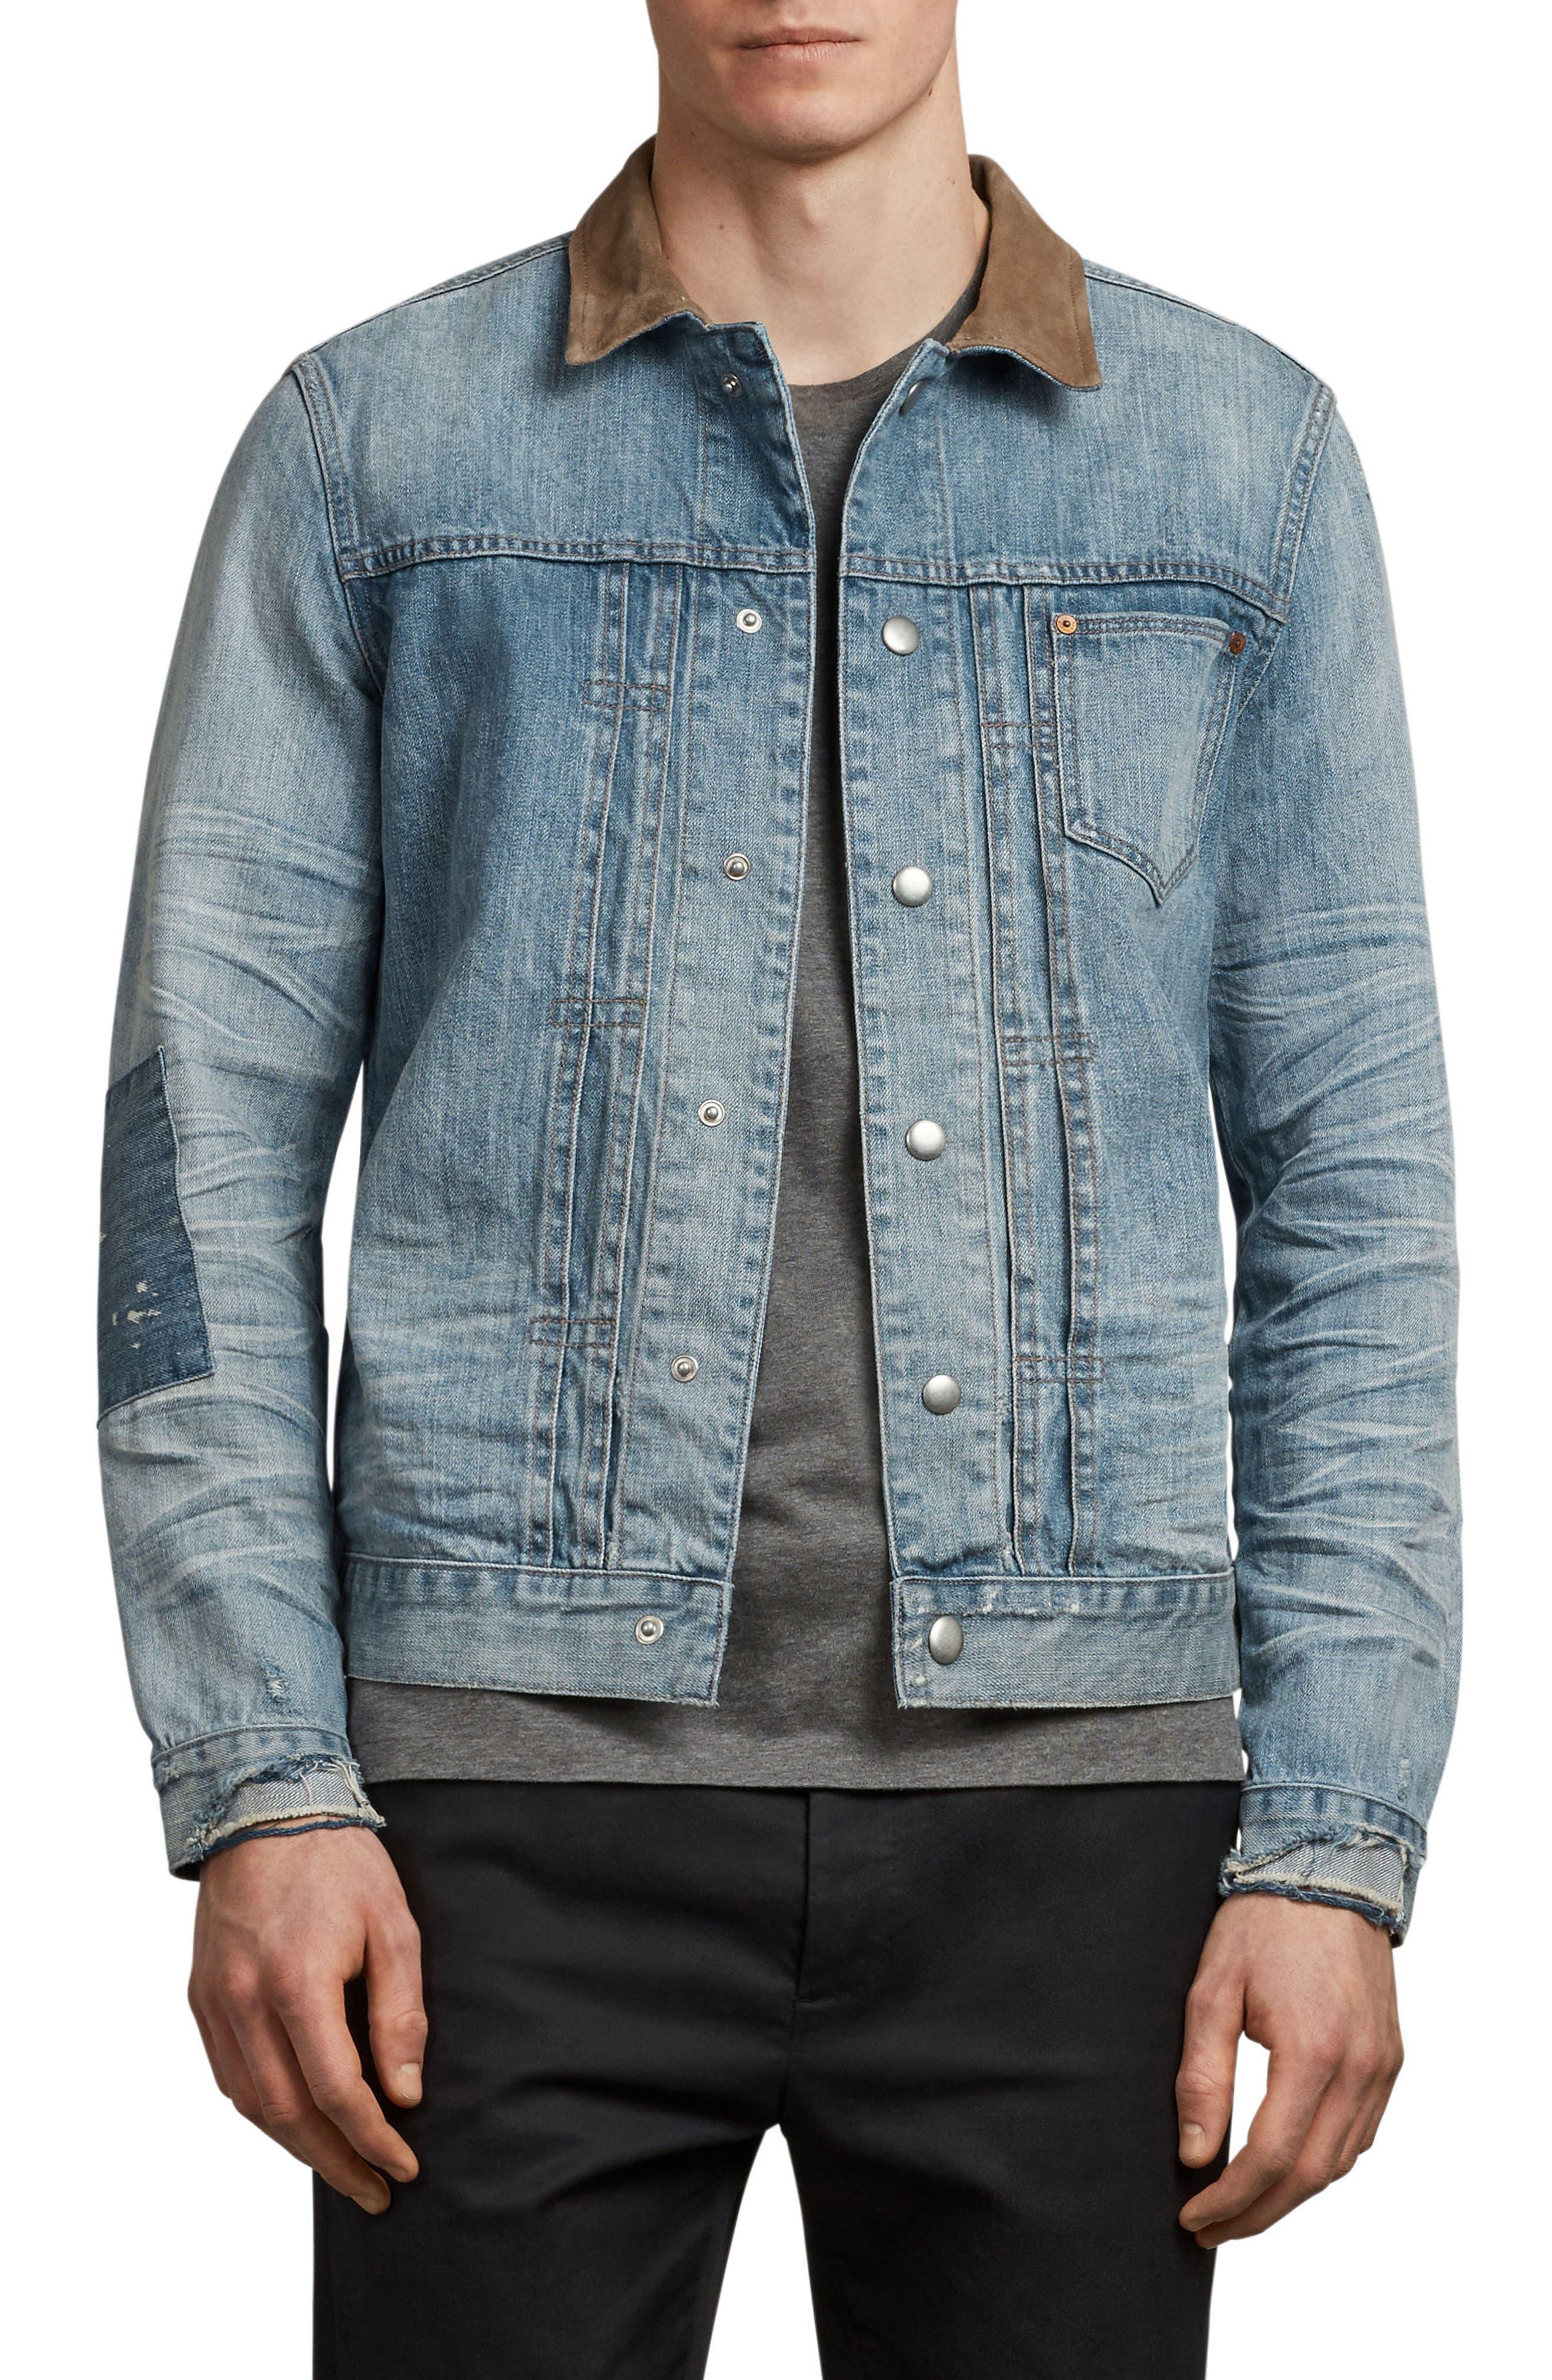 Ibanex Slim Fit Distressed Denim Jacket,                             Main thumbnail 1, color,                             460